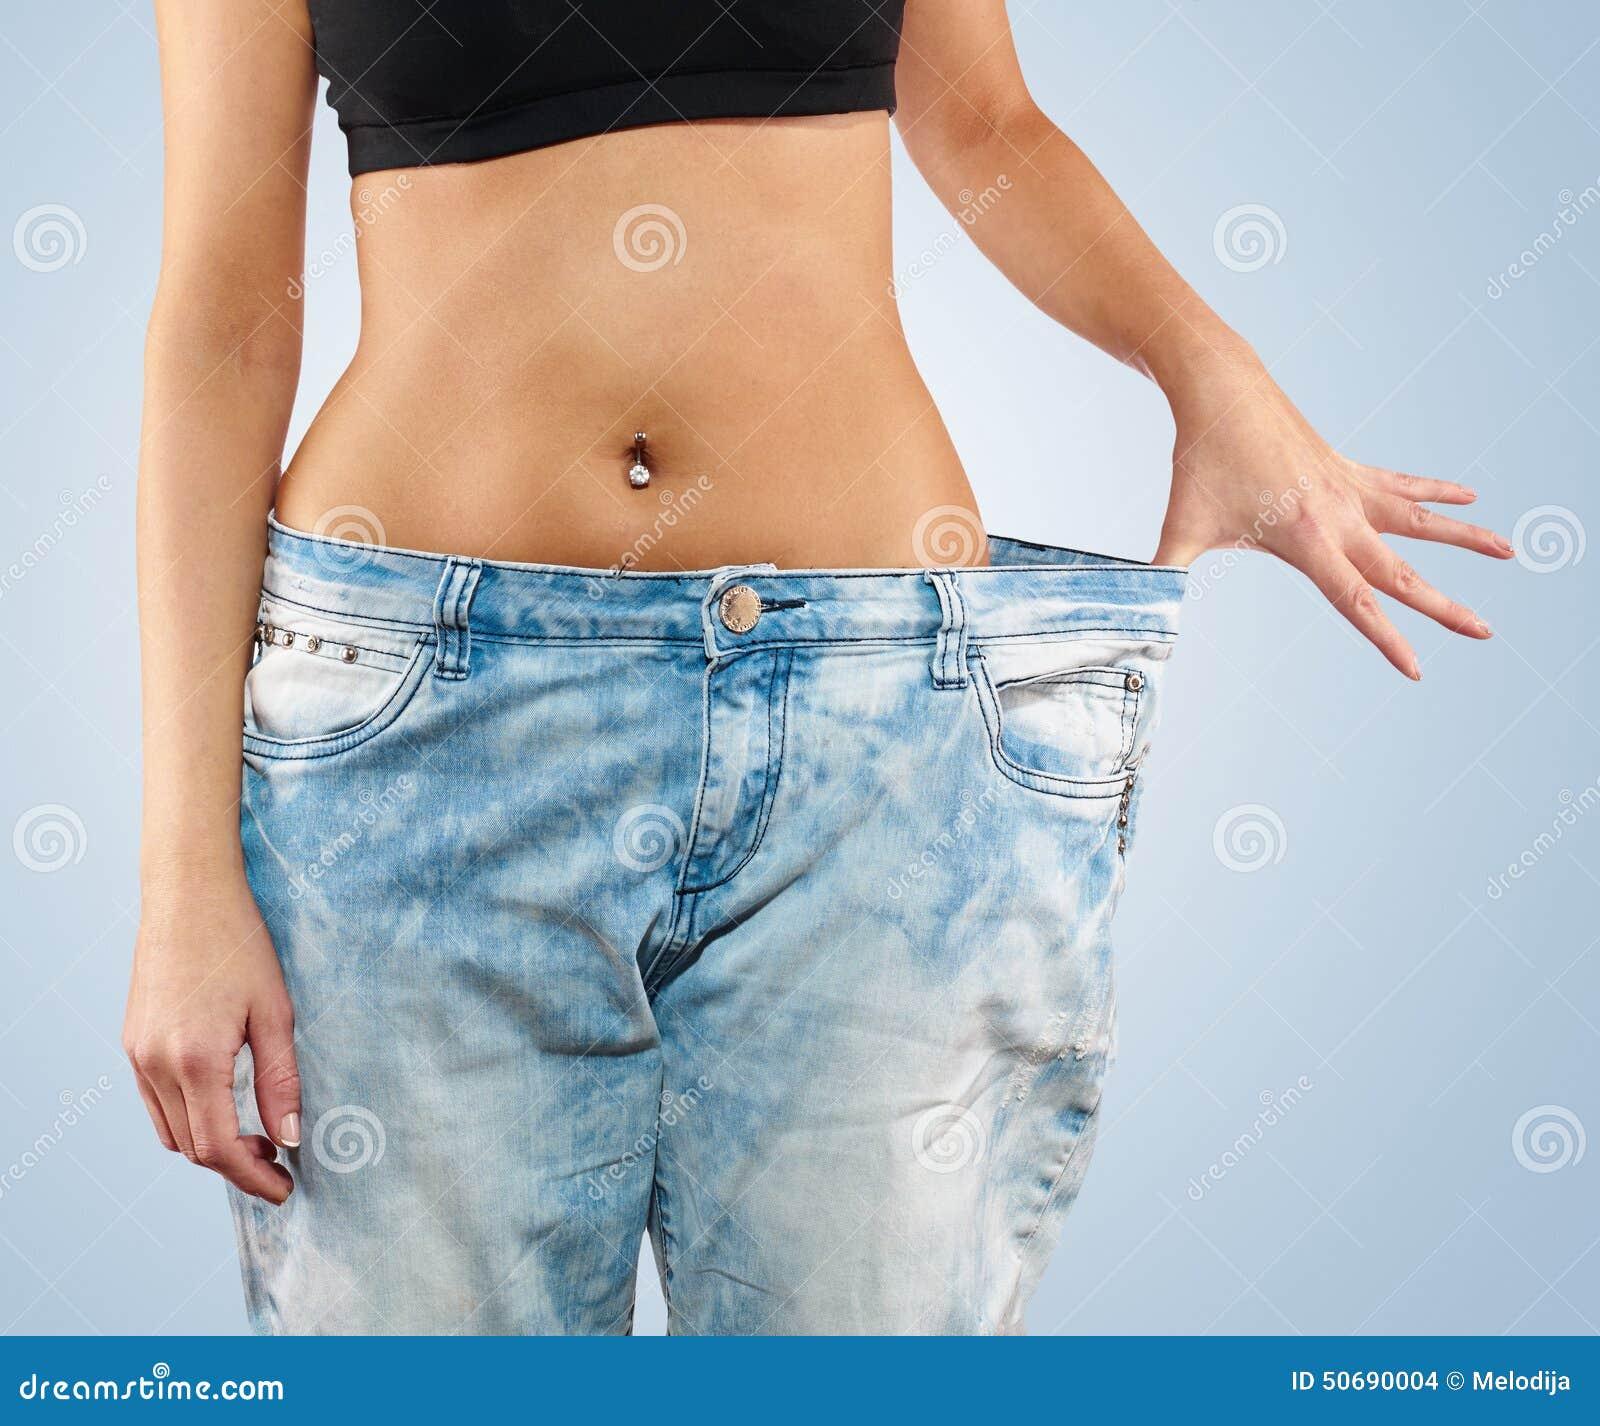 Download 有大牛仔裤减重的妇女 库存照片. 图片 包括有 牛仔裤, 顶层, 炫耀, 有吸引力的, 运动, beautifuler - 50690004